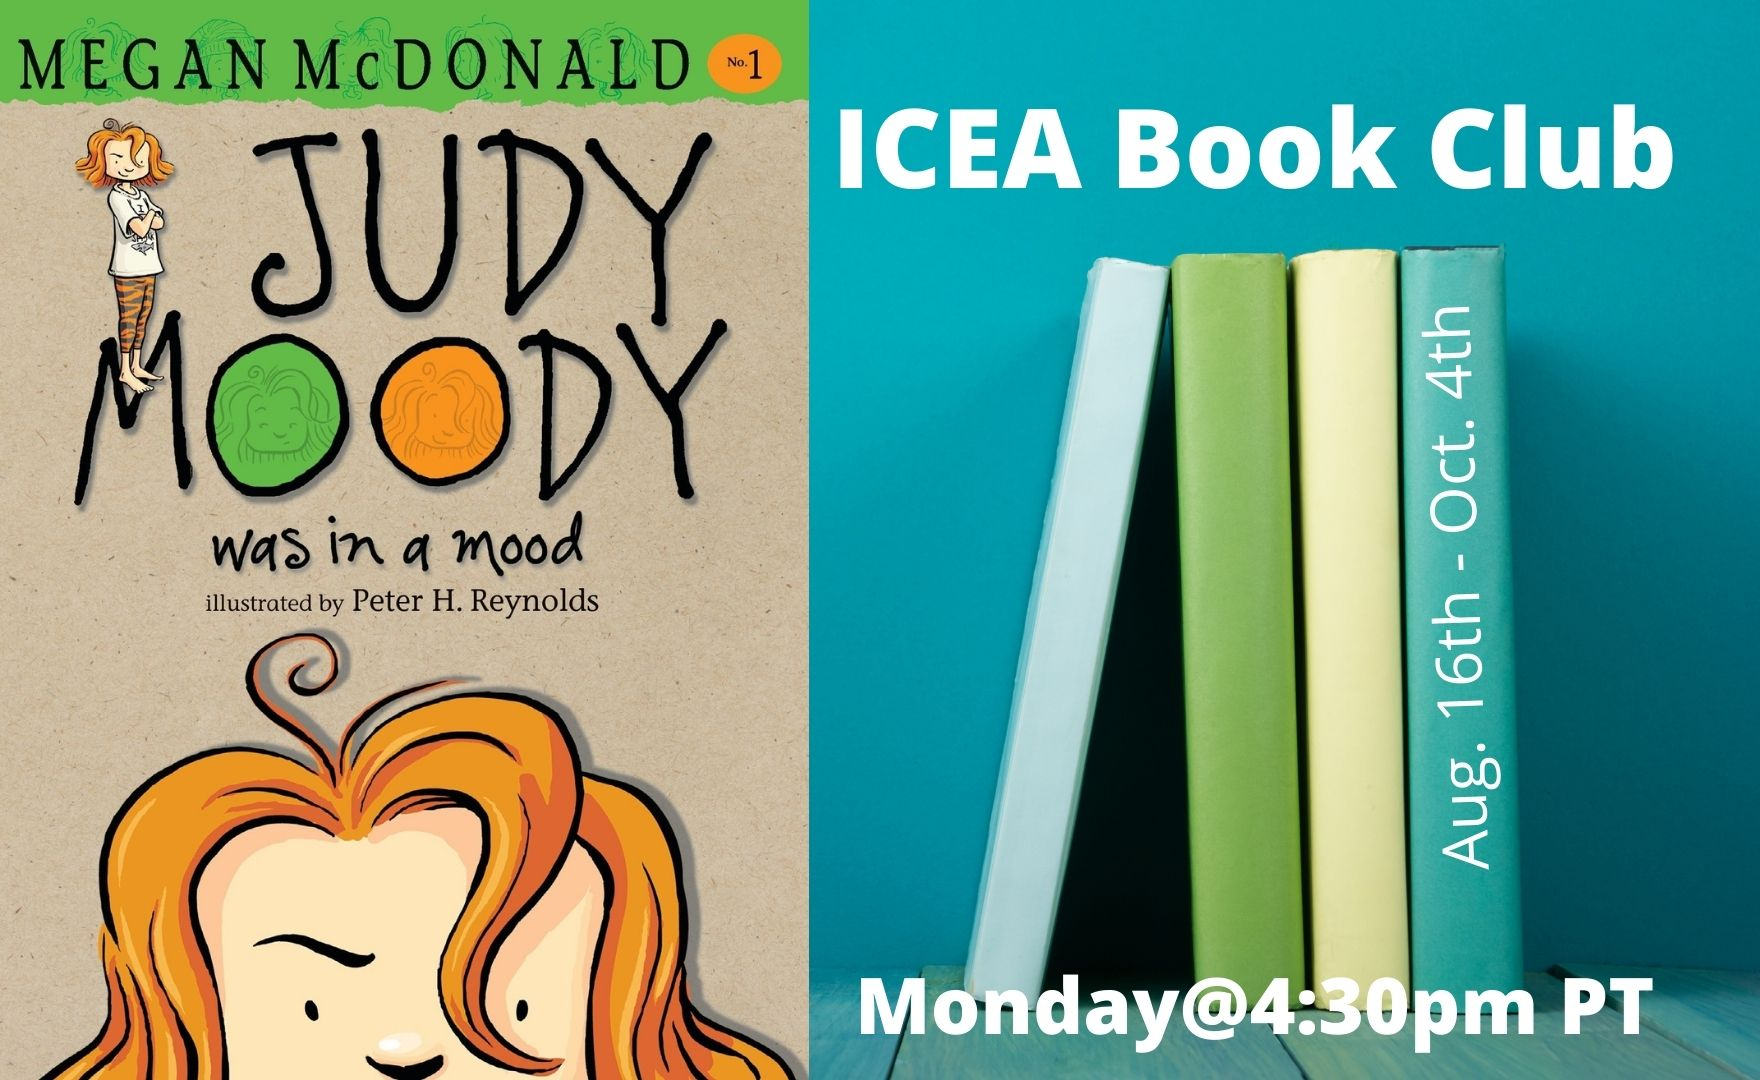 [Free] Book Club: Judy Moody was in a mood